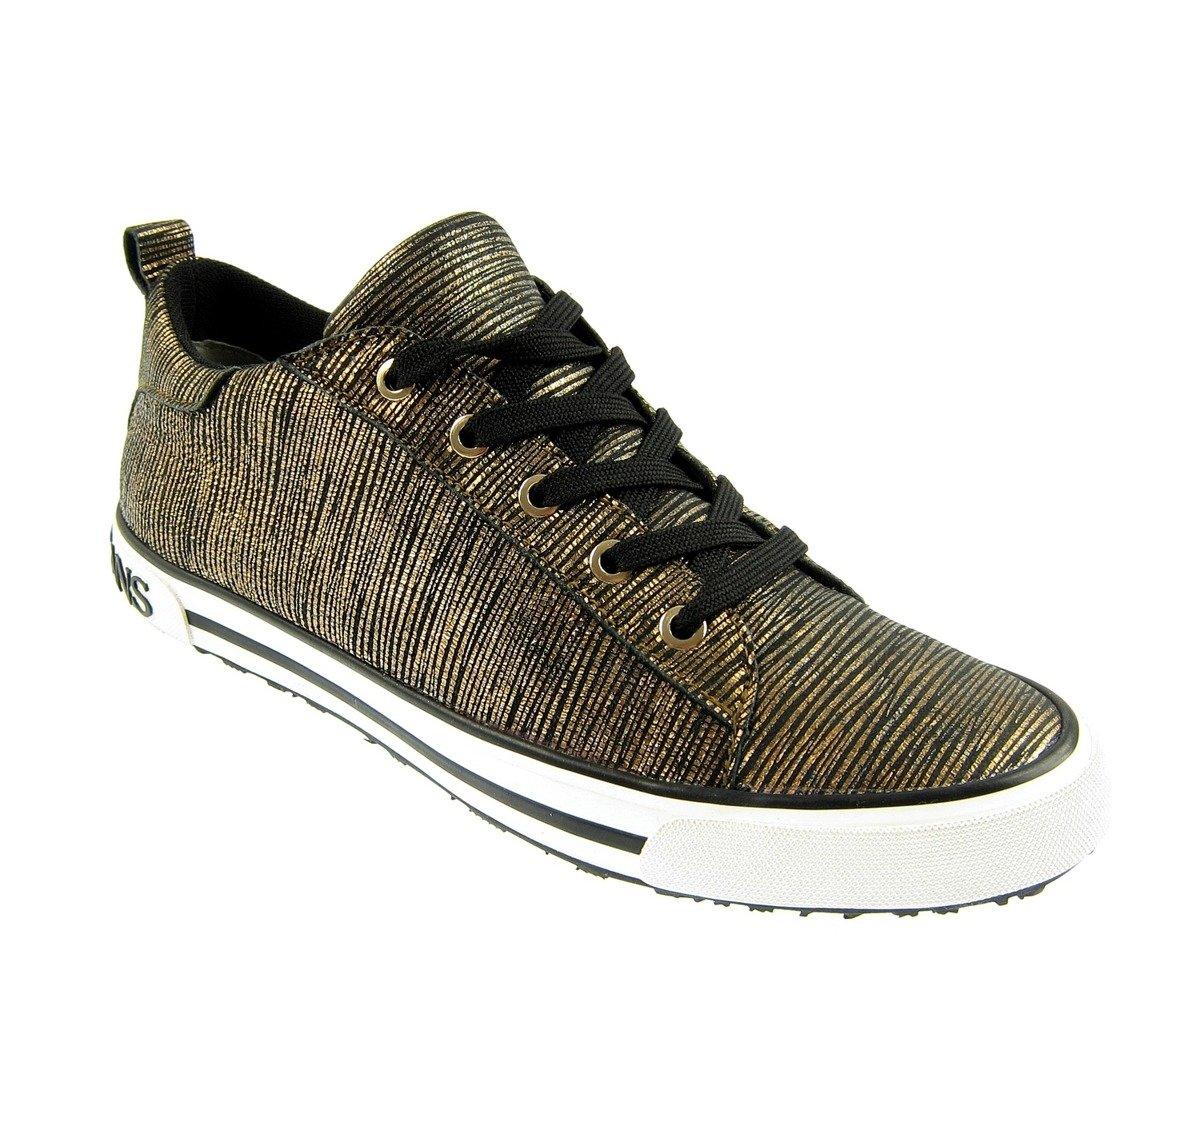 fe026bc485b9 ... ARMANI JEANS 925907 Damen Women Sneaker Schuhe Shoes Gold Rust Brown  Click to zoom ...